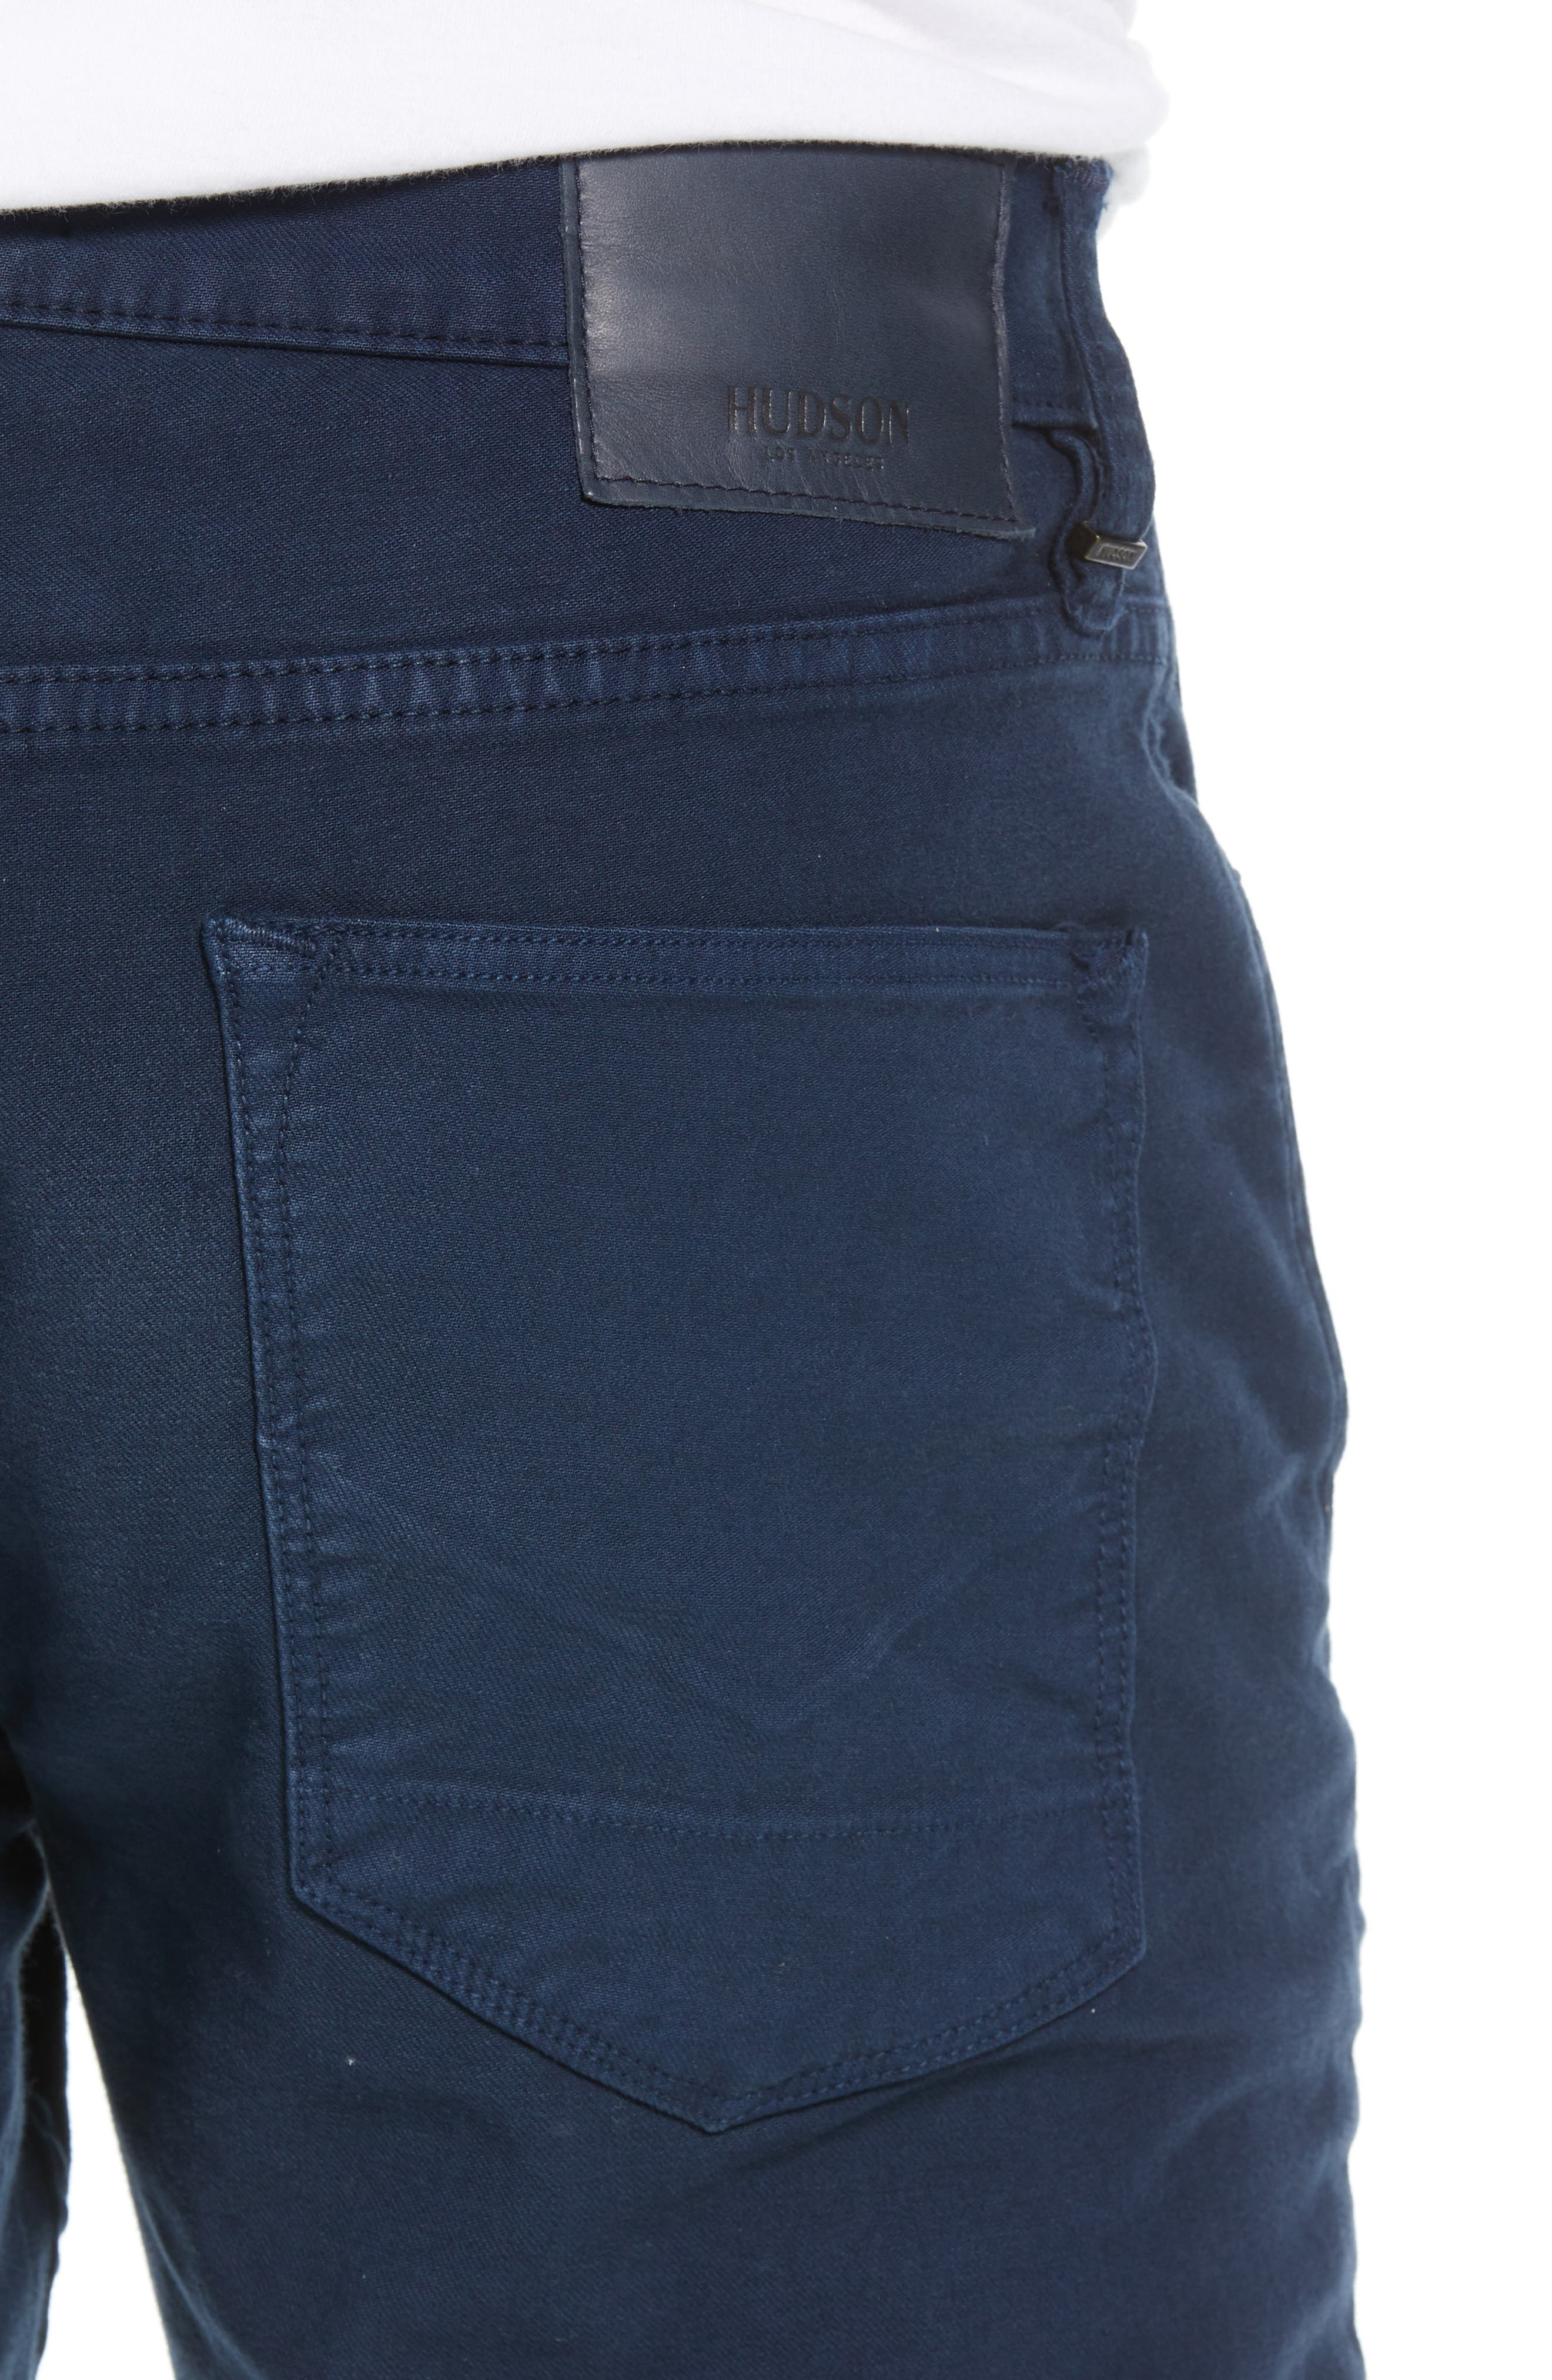 Hudson Axl Skinny Fit Jeans,                             Alternate thumbnail 4, color,                             SAILOR BLUE